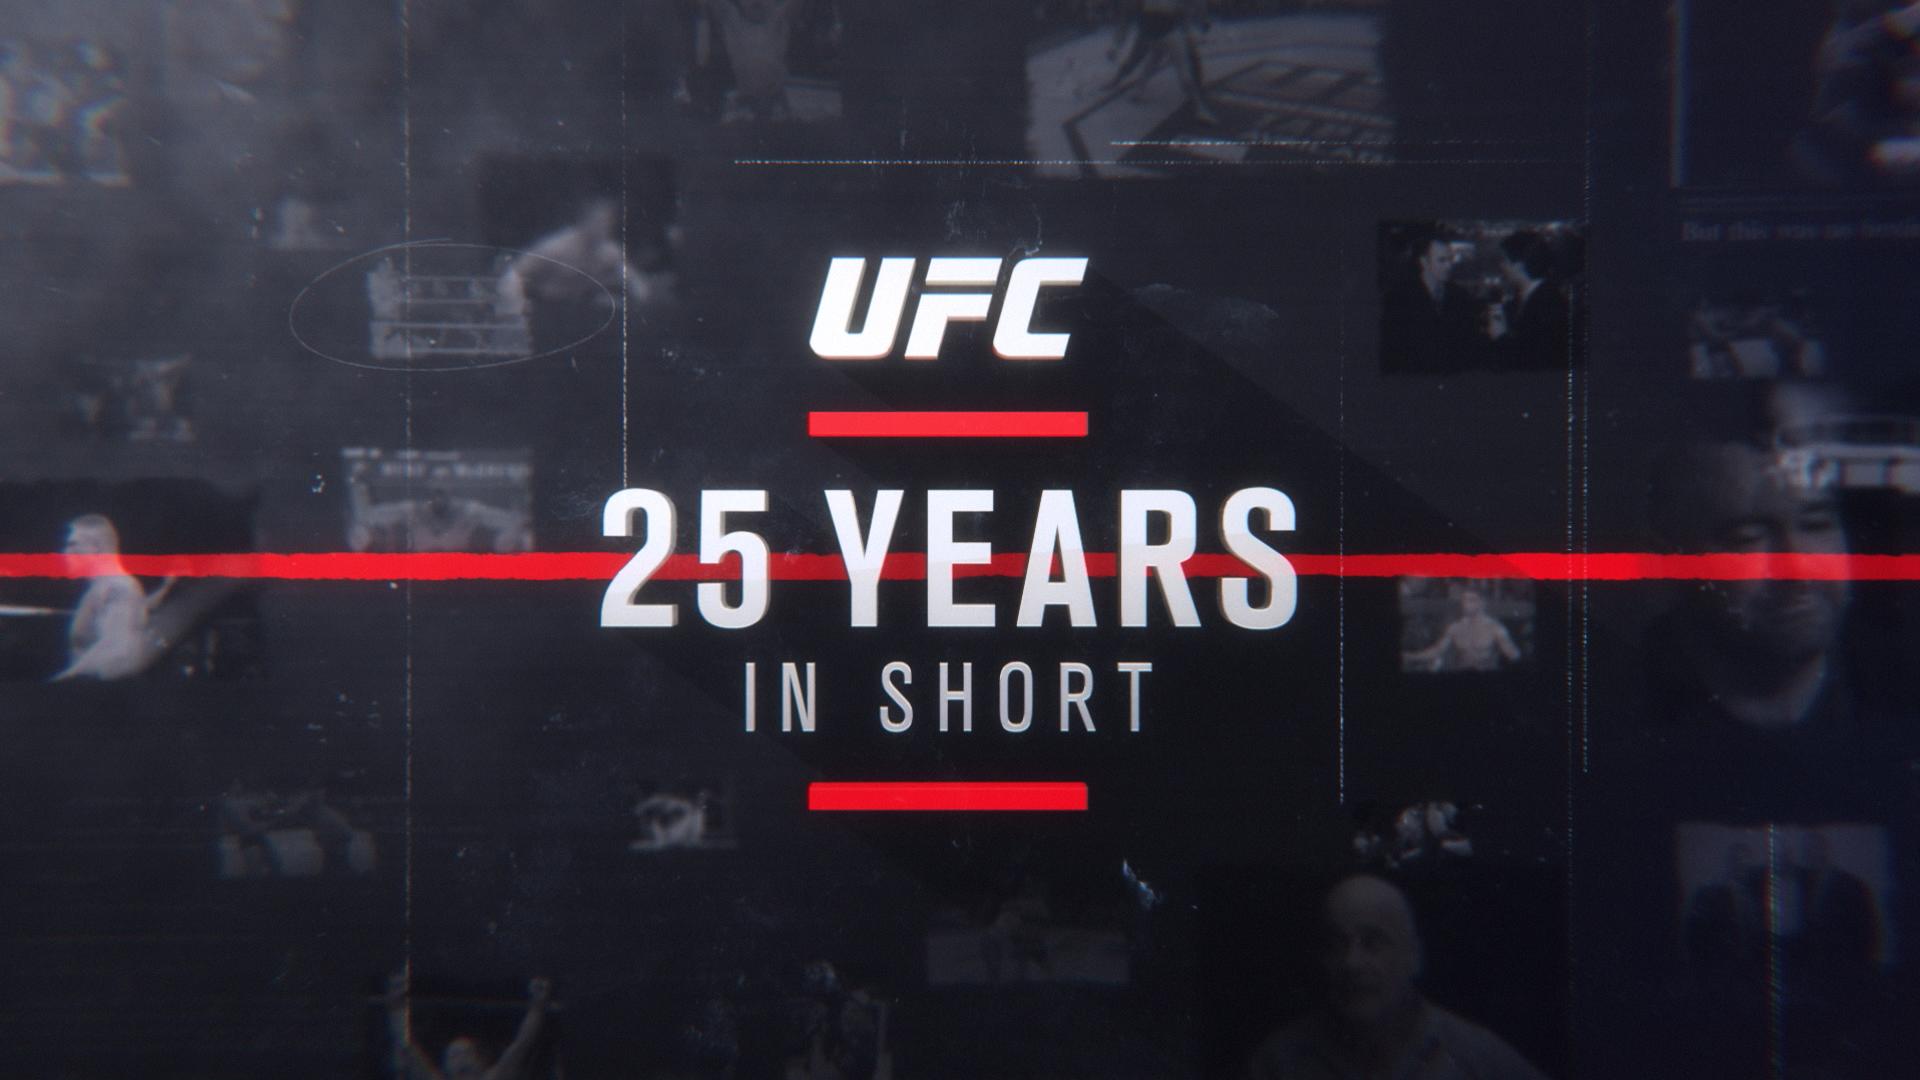 UFC | 25 Years In Short